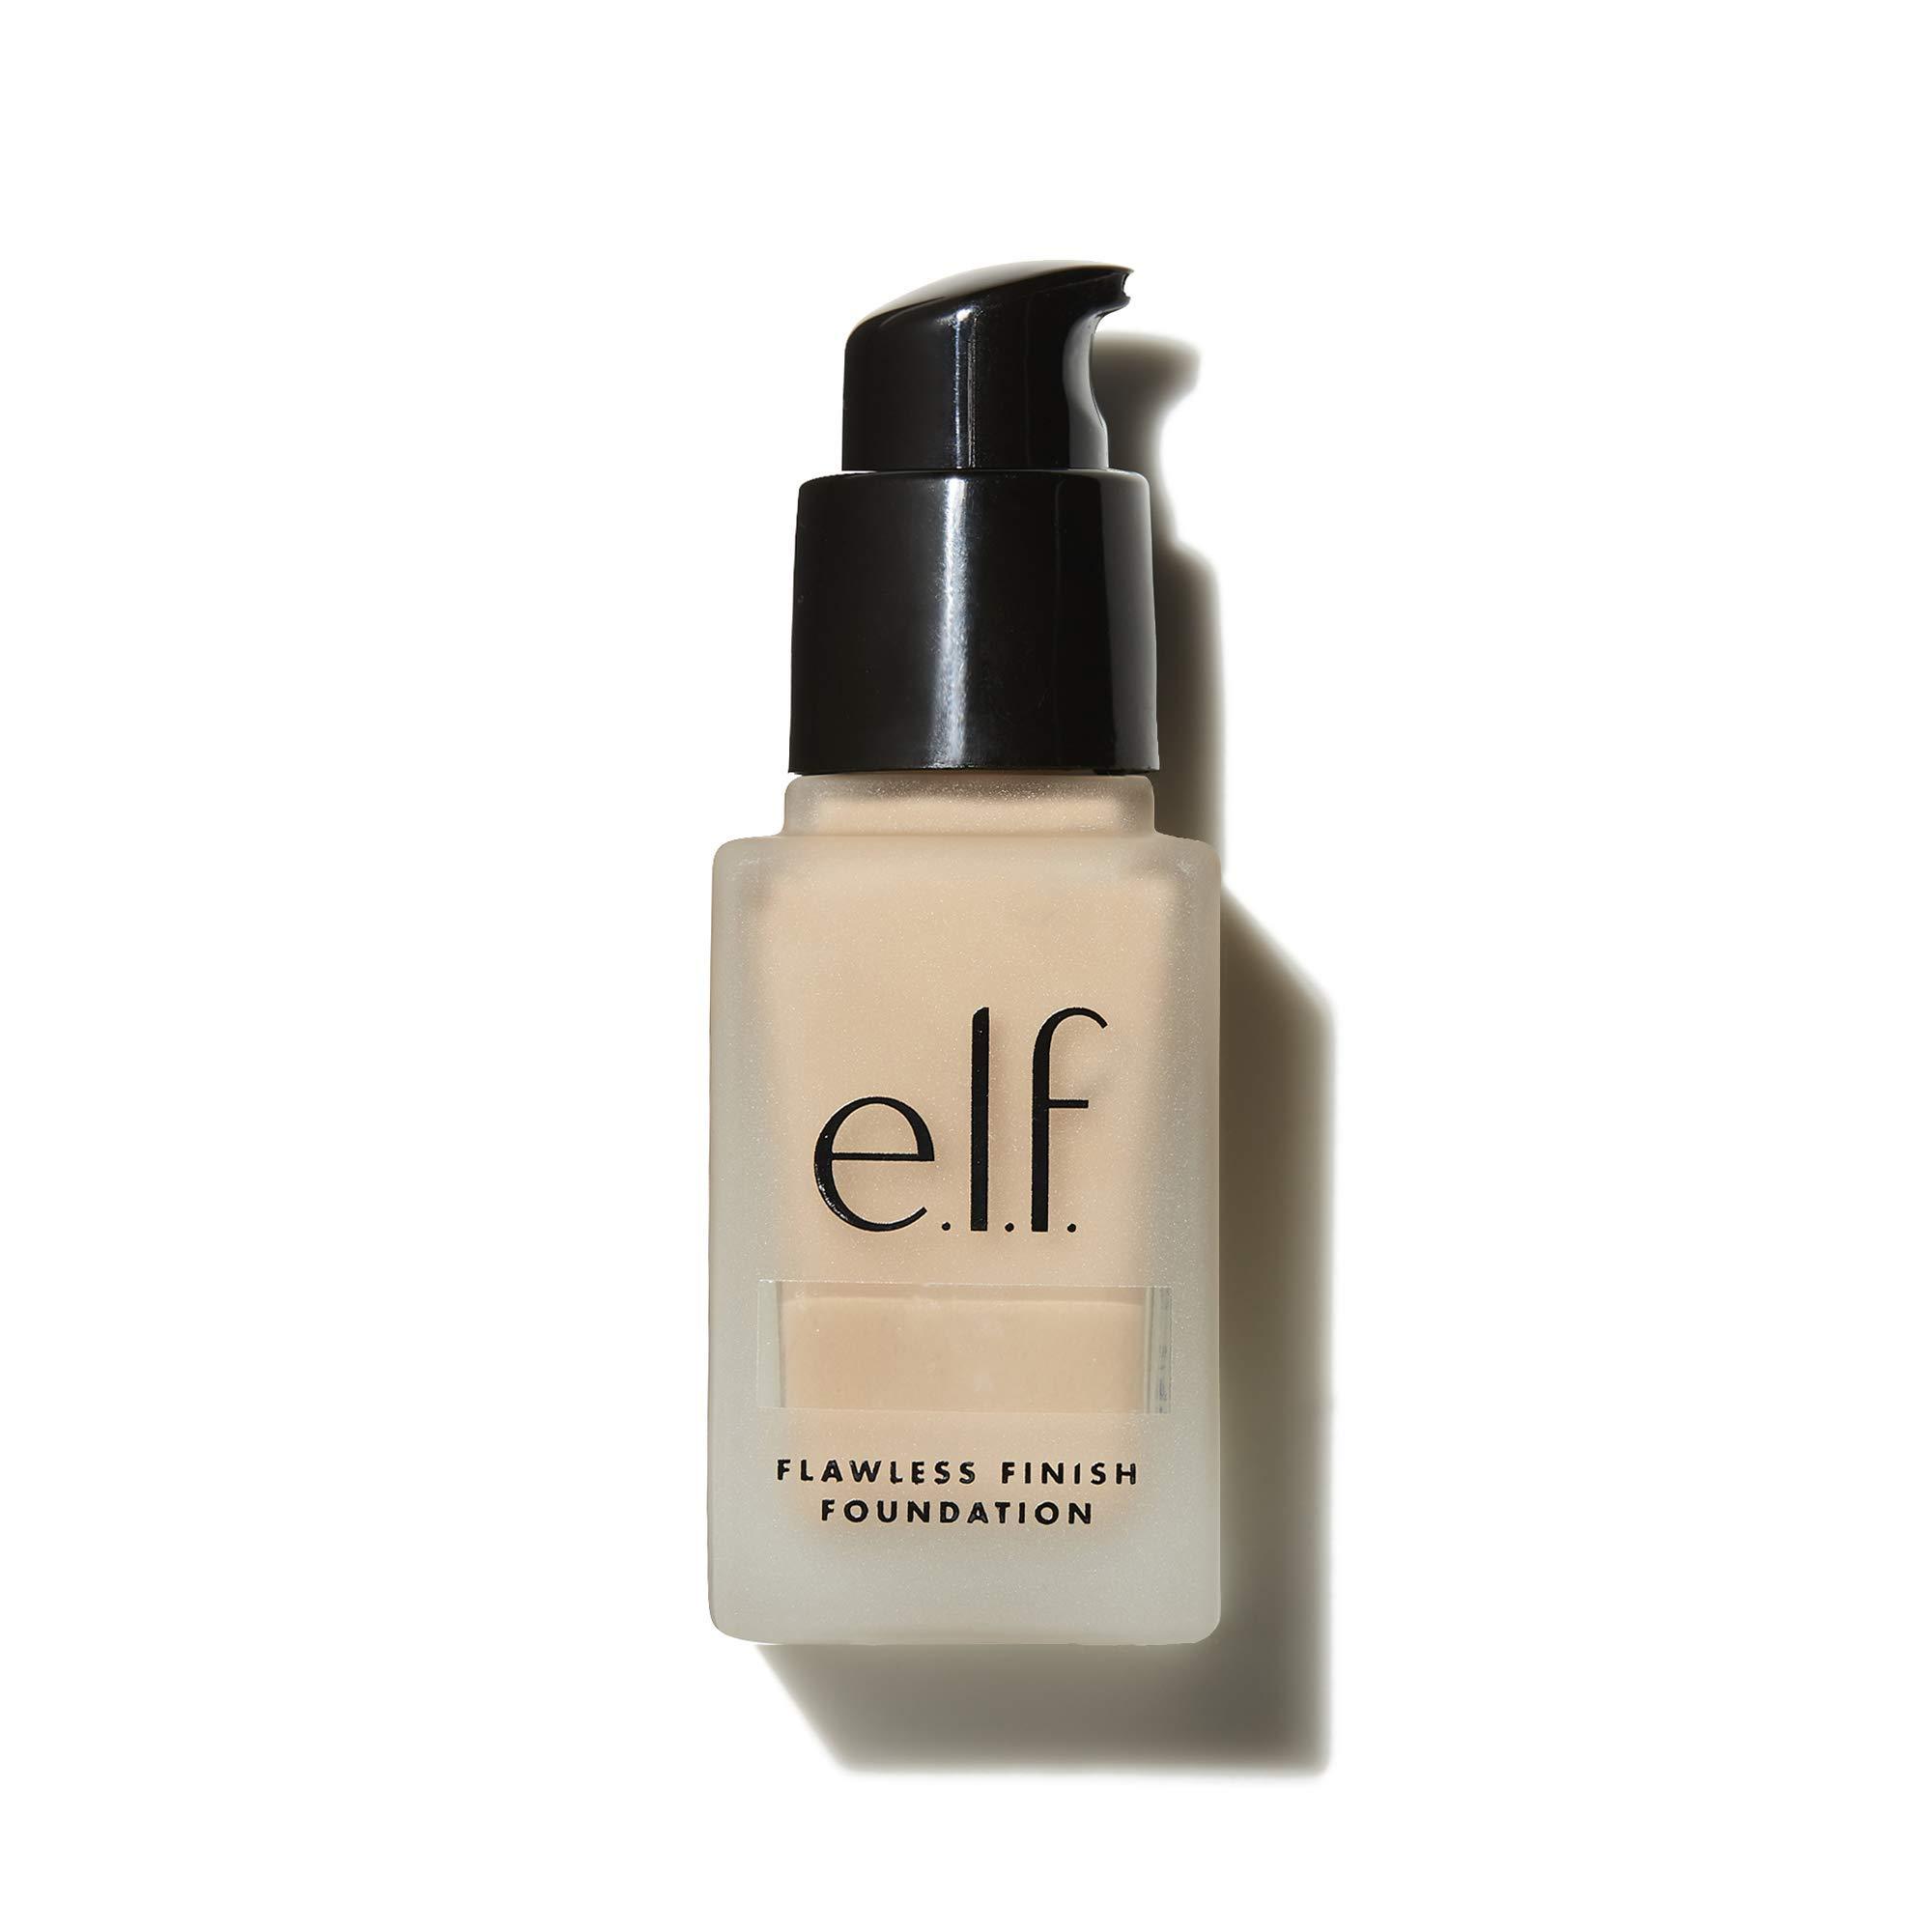 e.l.f. Flawless Finish Foundation   Lightweight, Medium Coverage & Semi-Matte   Beige   0.68 Fl Oz (20mL)